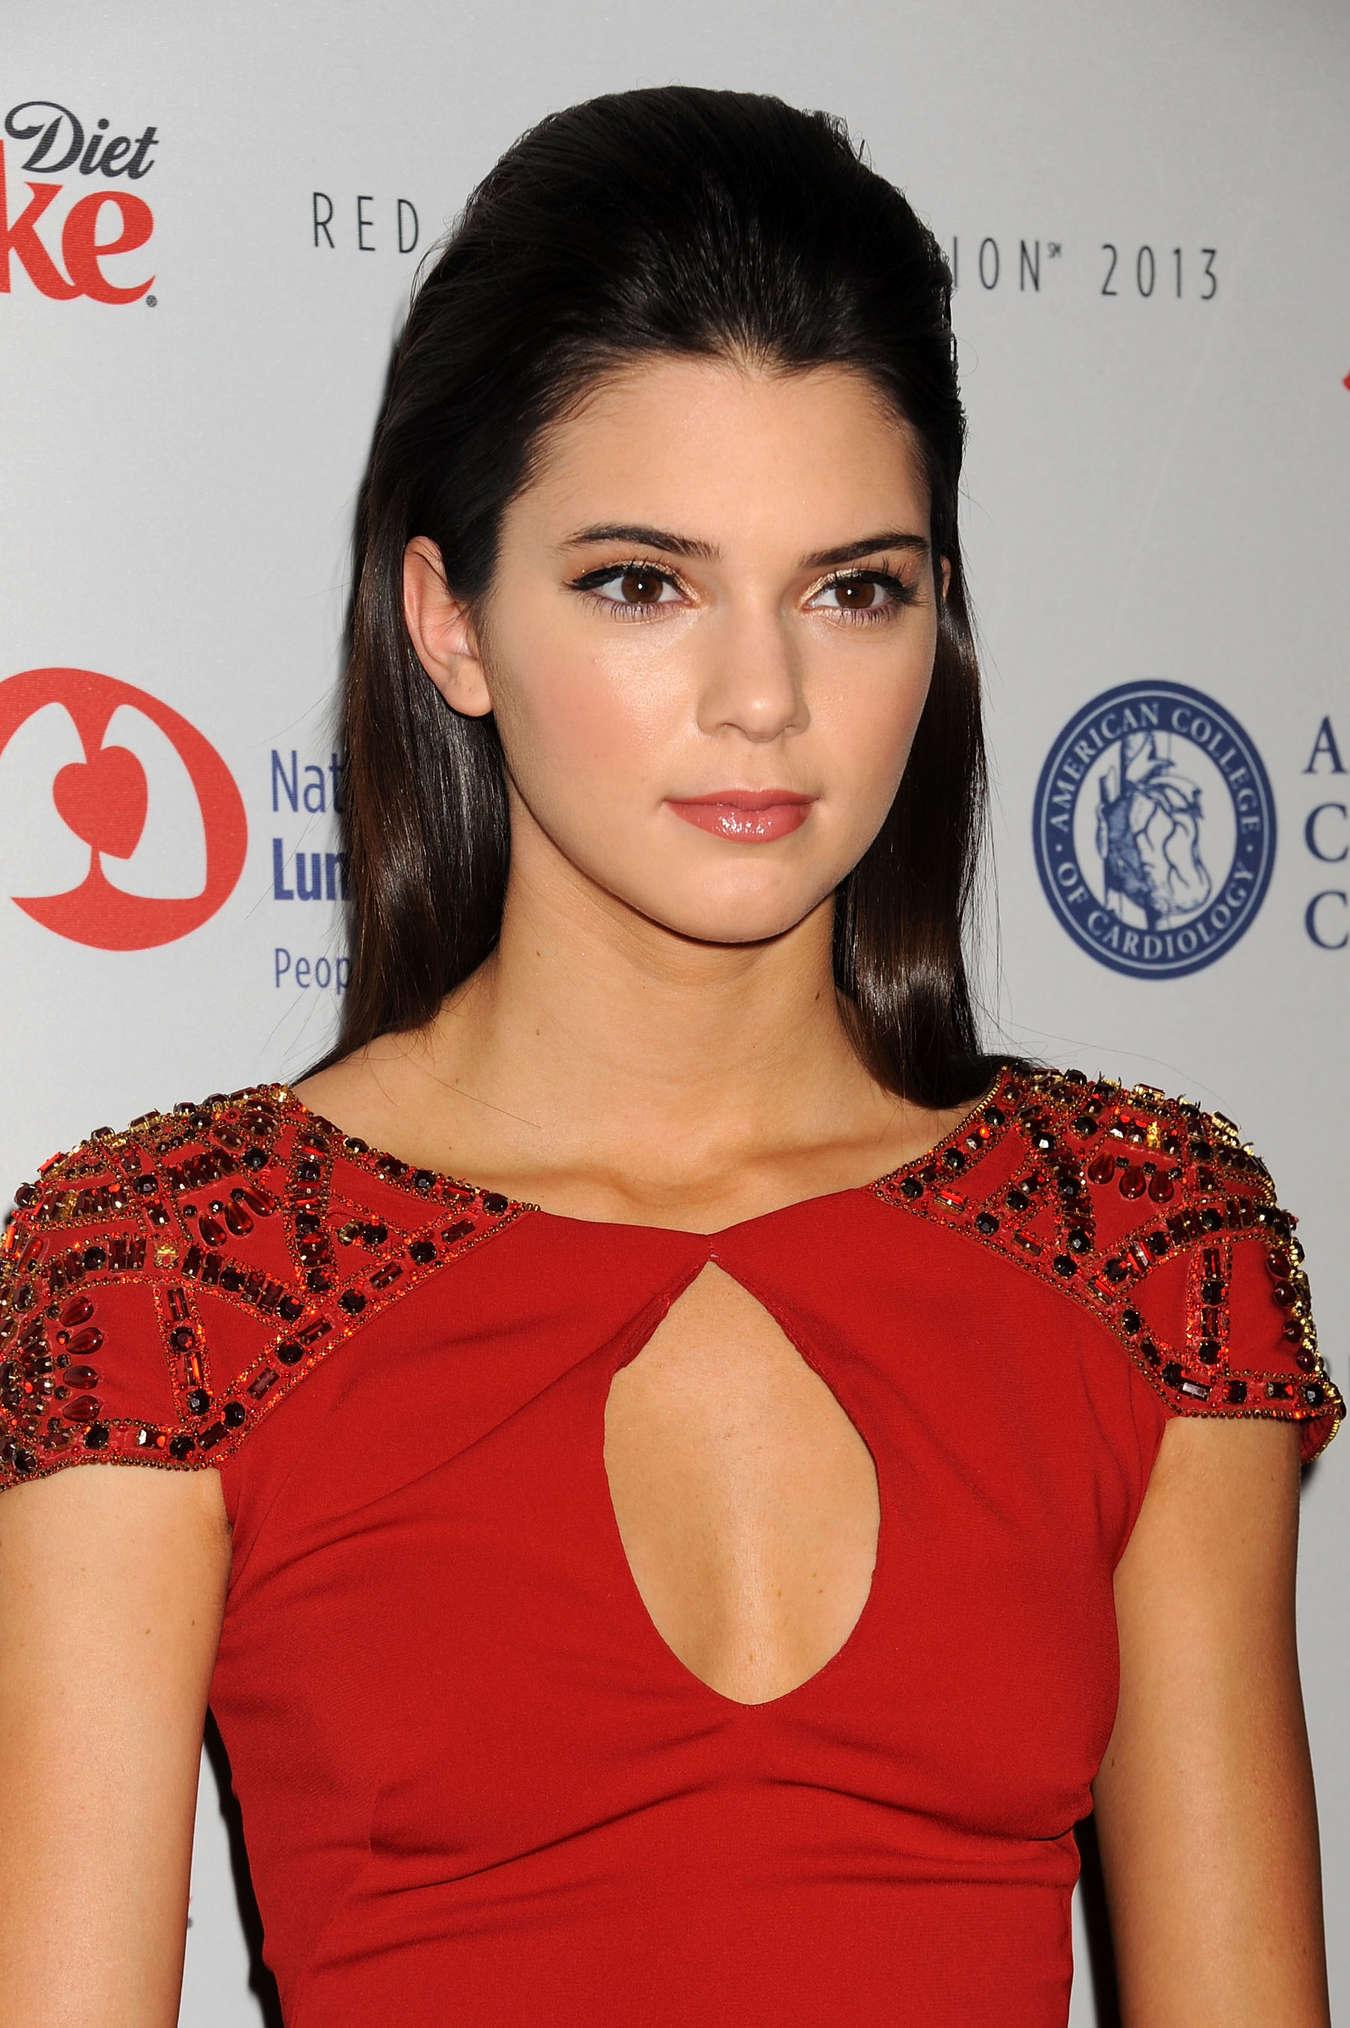 Kendall Jenner 2013 Fashion Show-02 – GotCelebKendall Jenner 2013 Hair